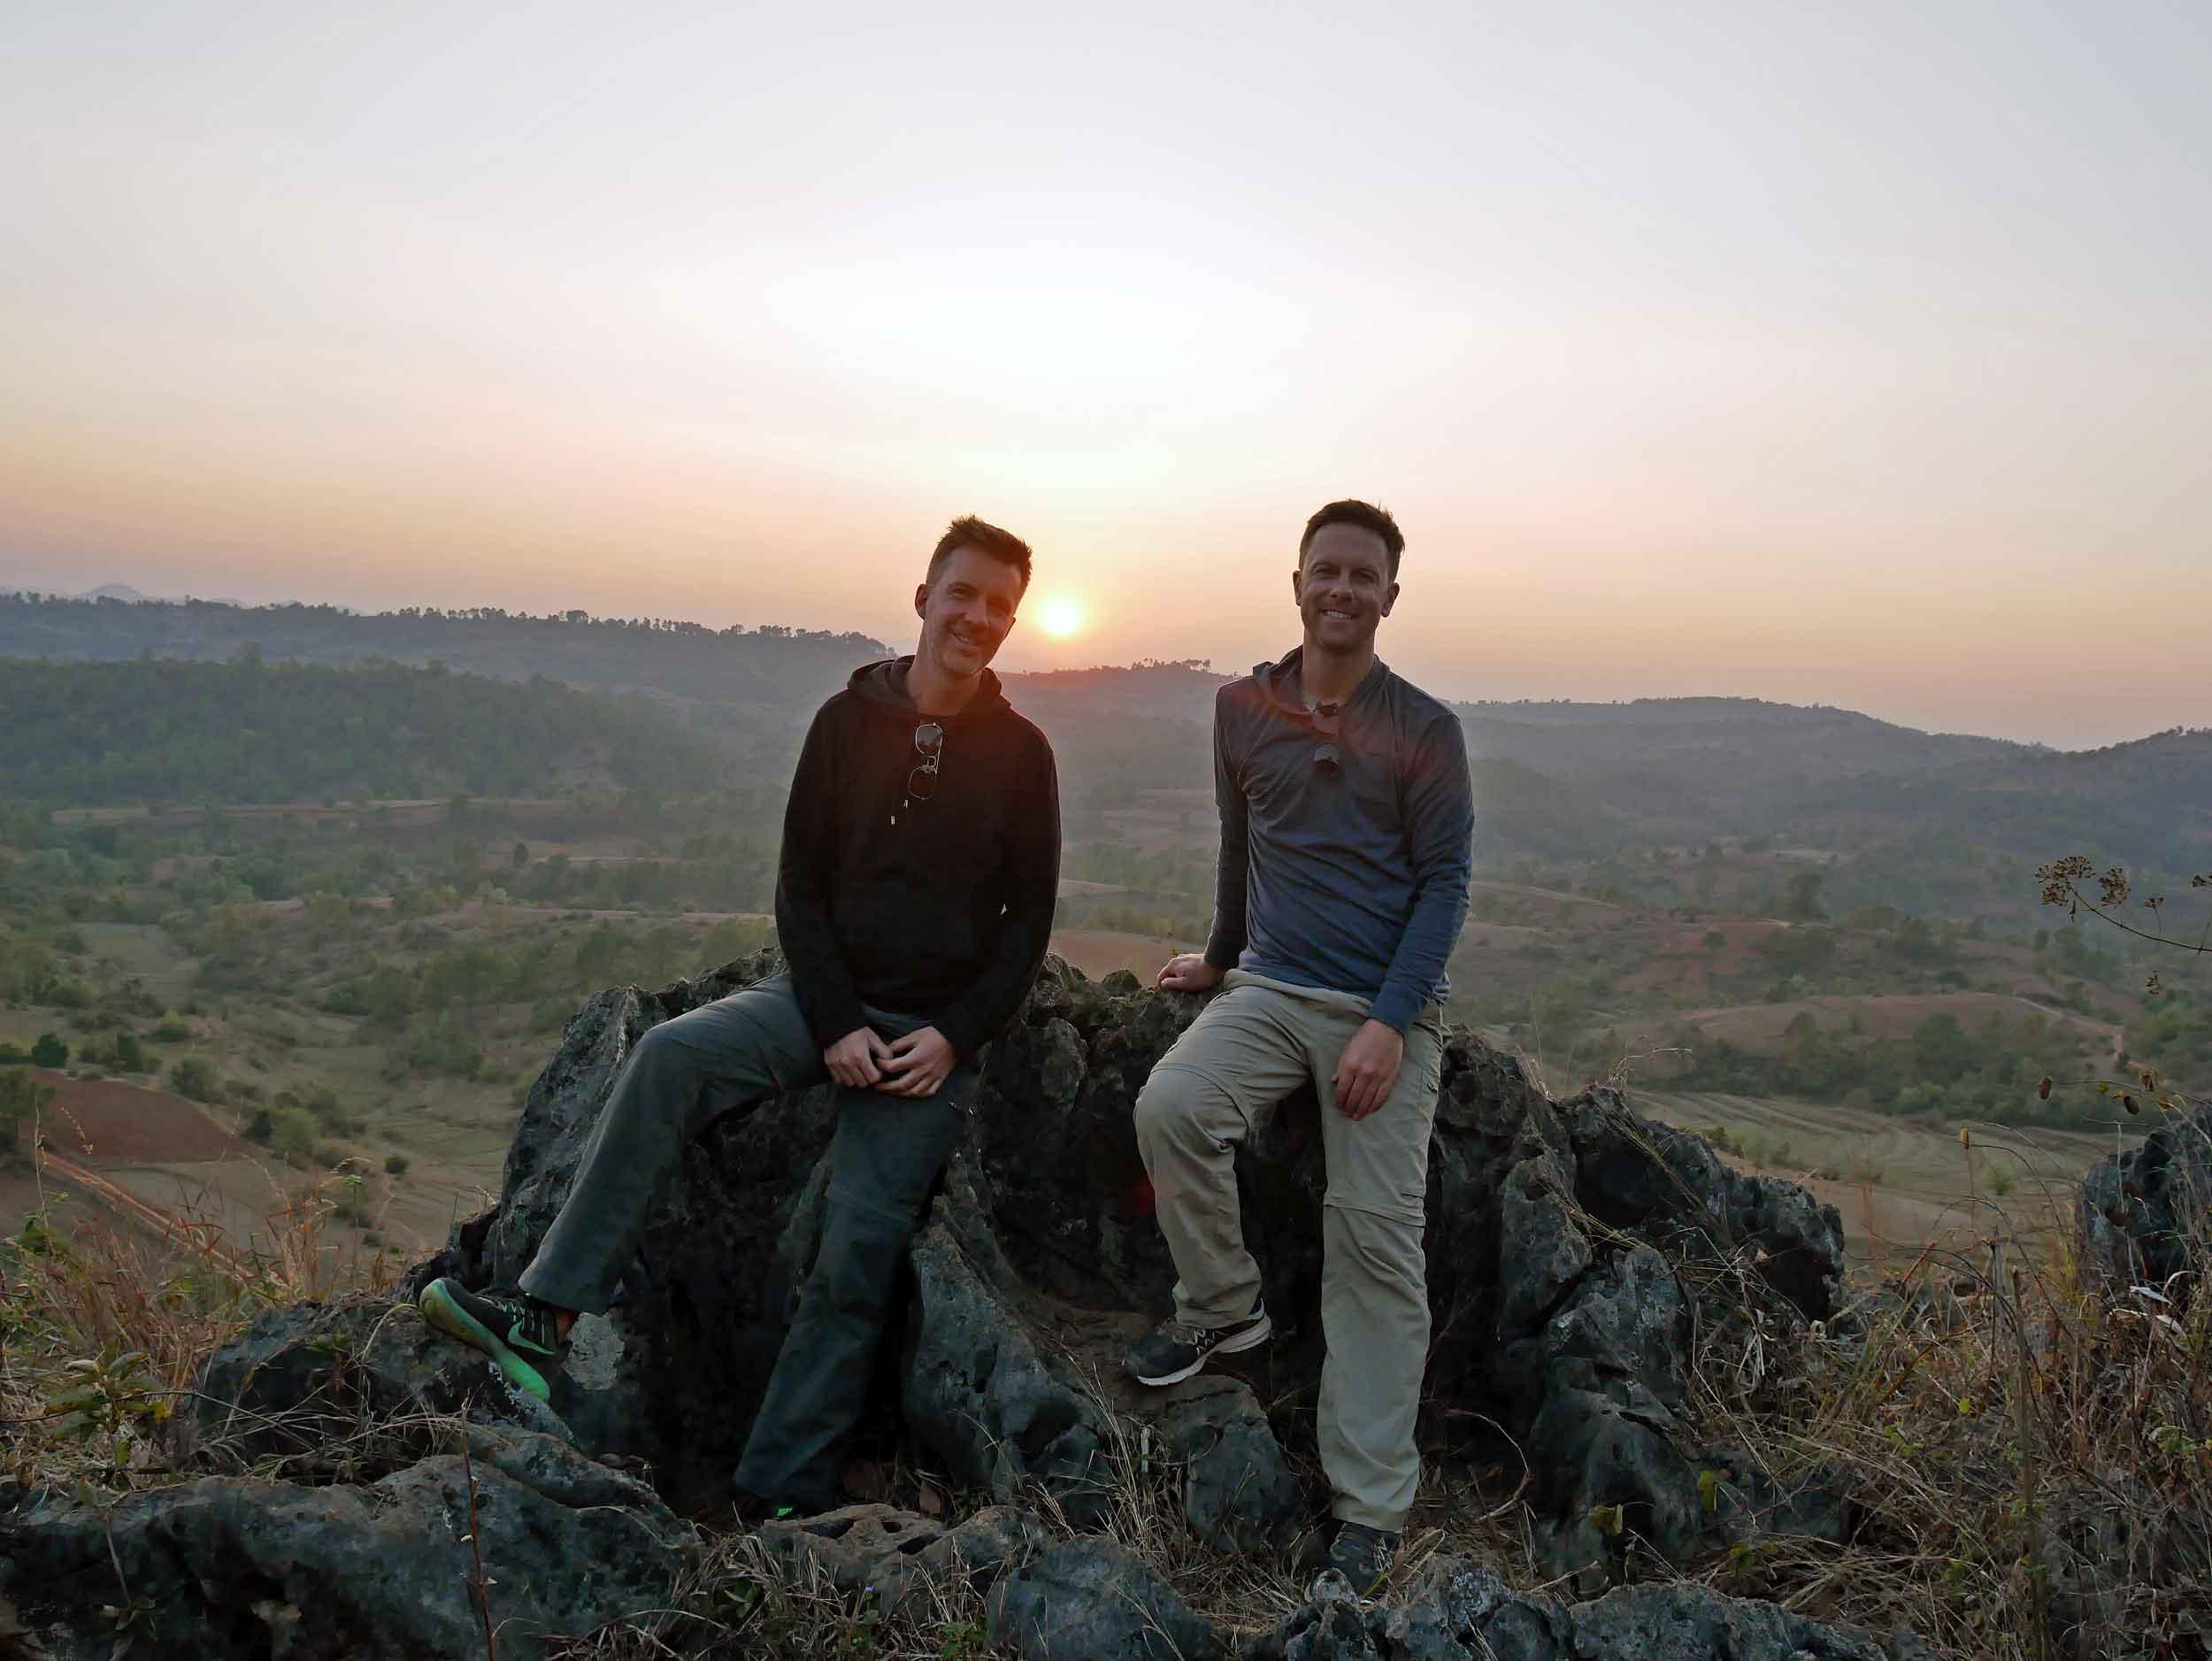 After a daylong trek, sunset near Pattu Pauk village provided time for reflection and rest (Feb 20).